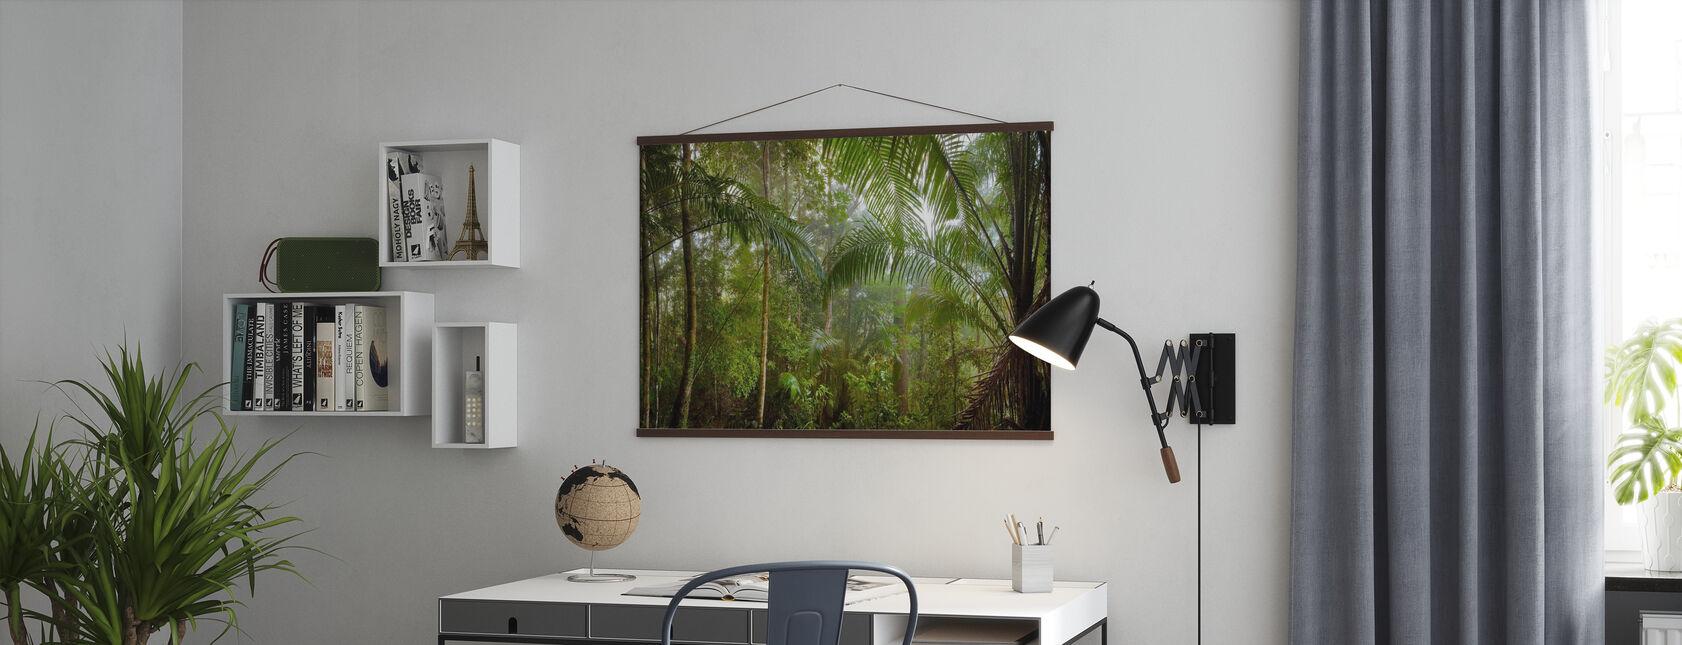 Borneo Tropical Rainforest - Poster - Office